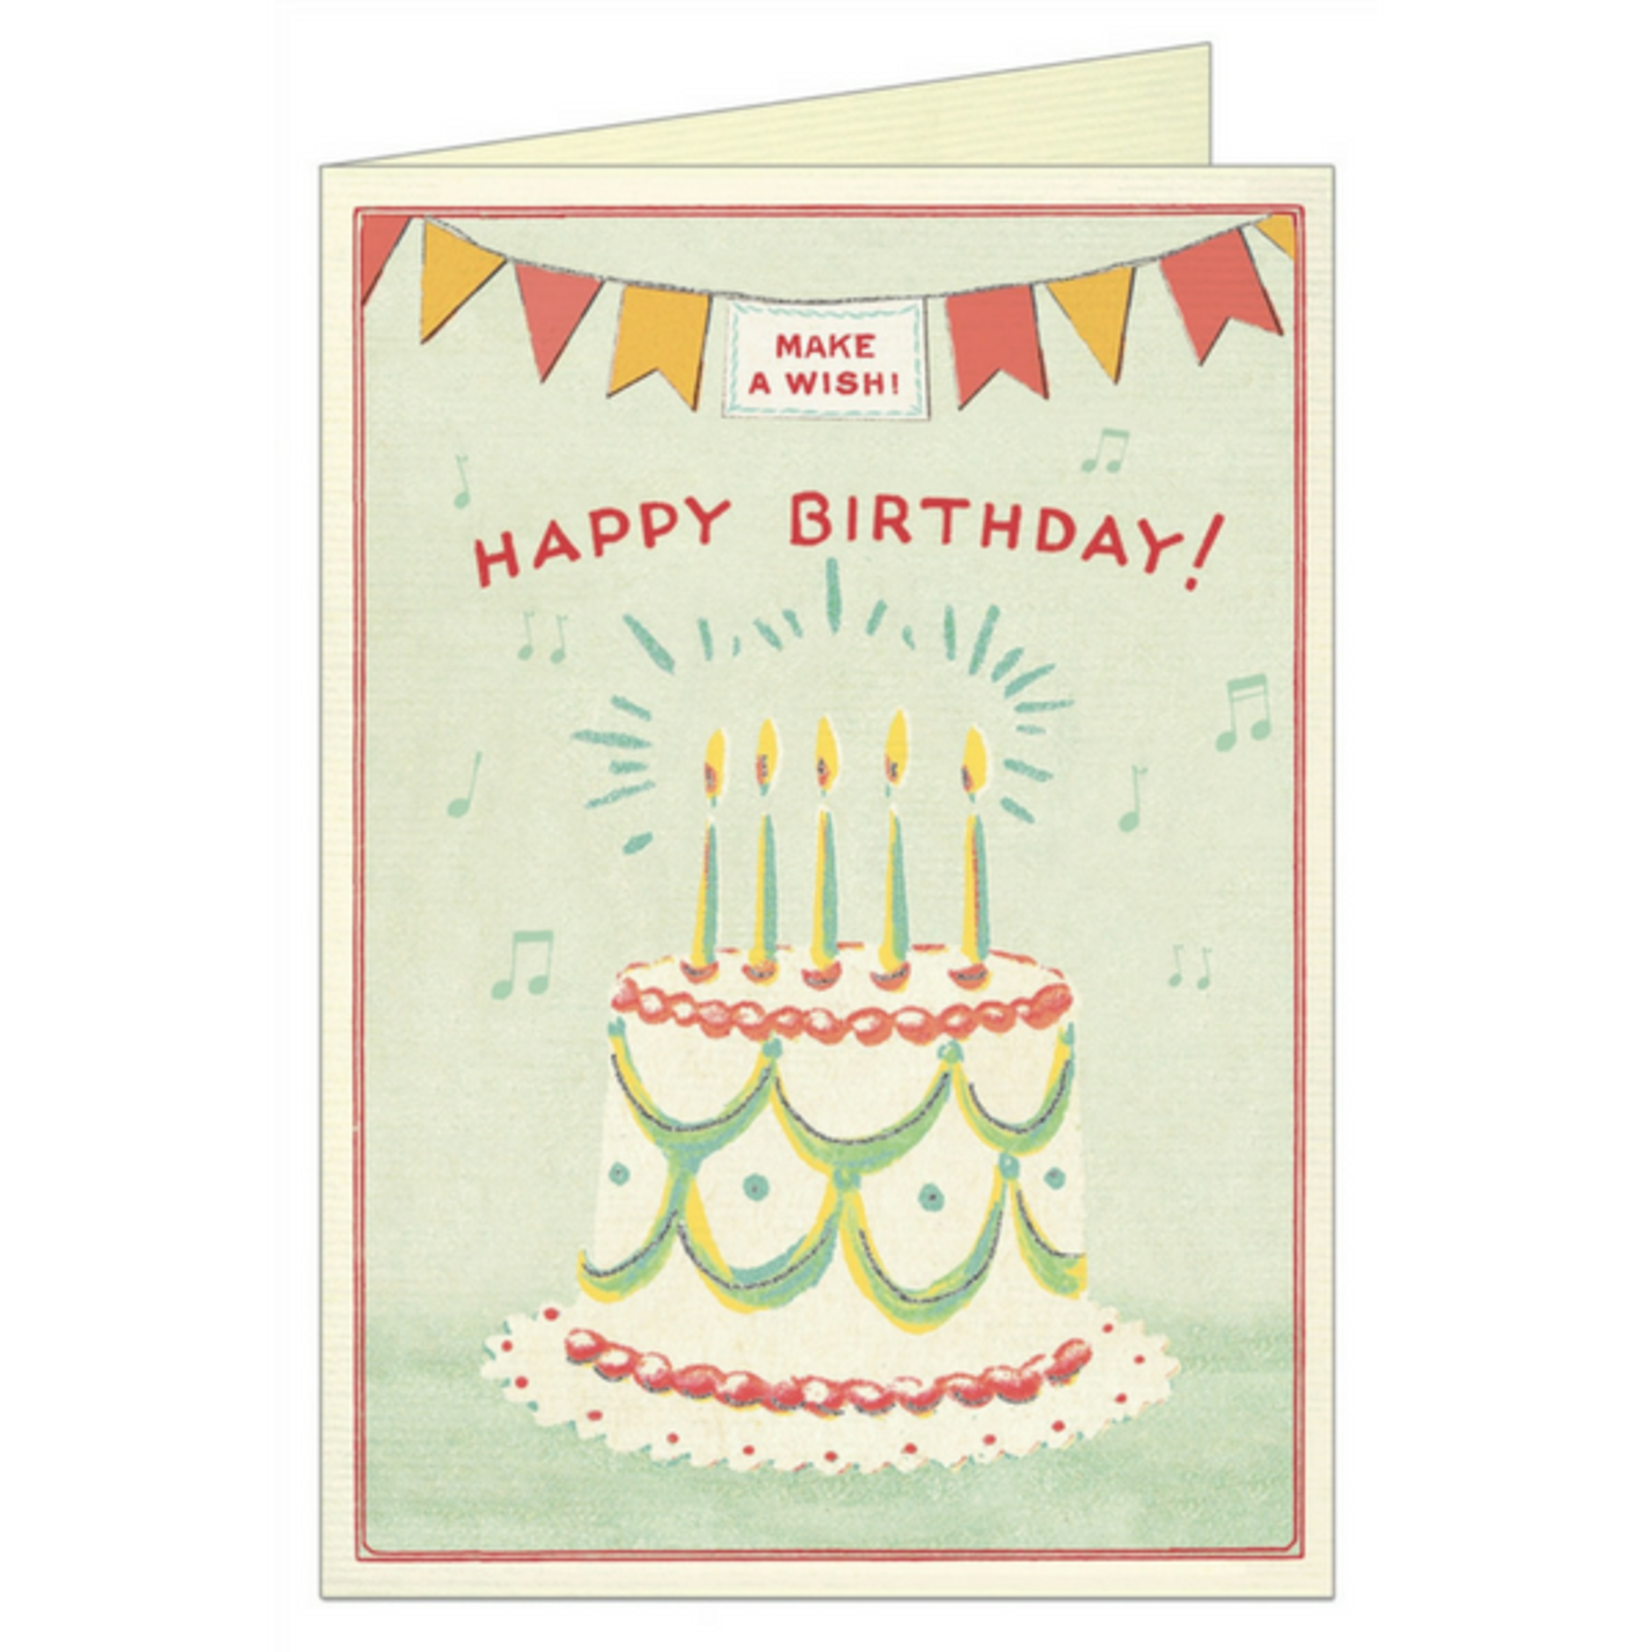 Birthday Card: Make a Wish